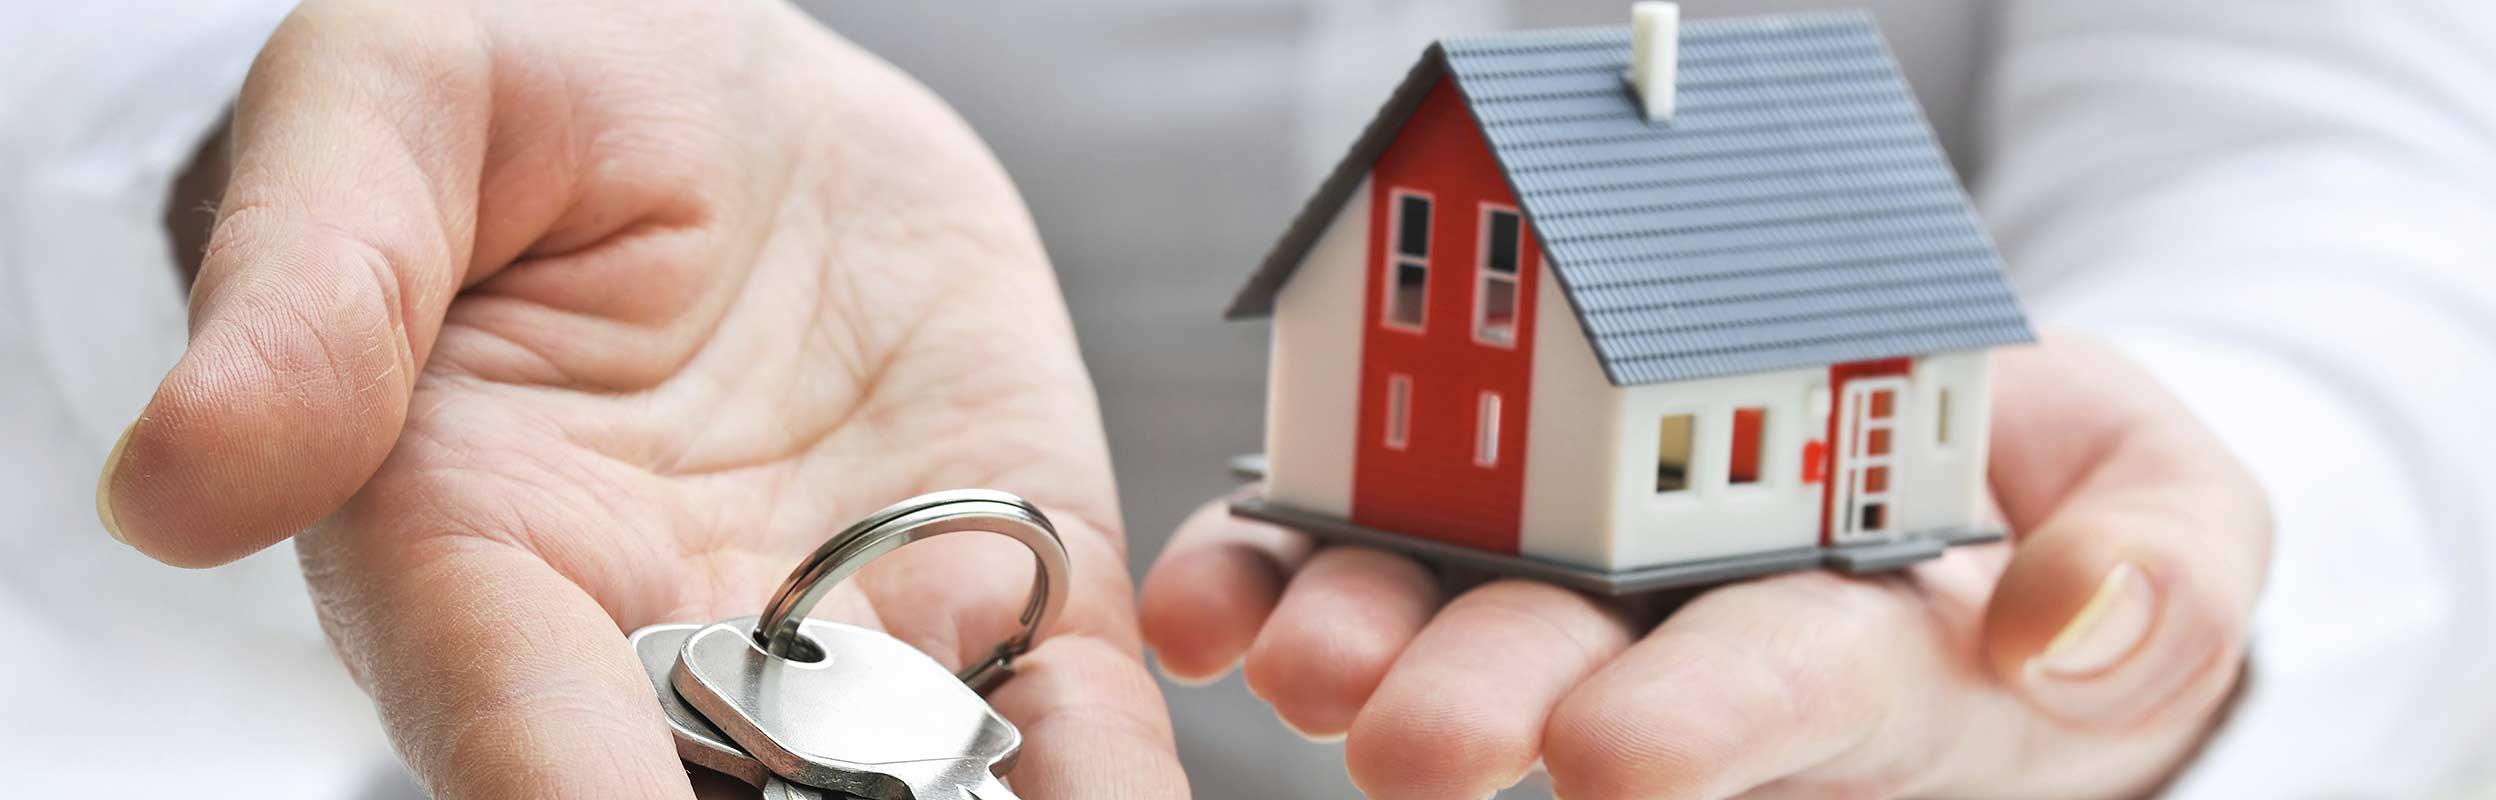 Depot De Garantie Achat Immobilier Sans Apport